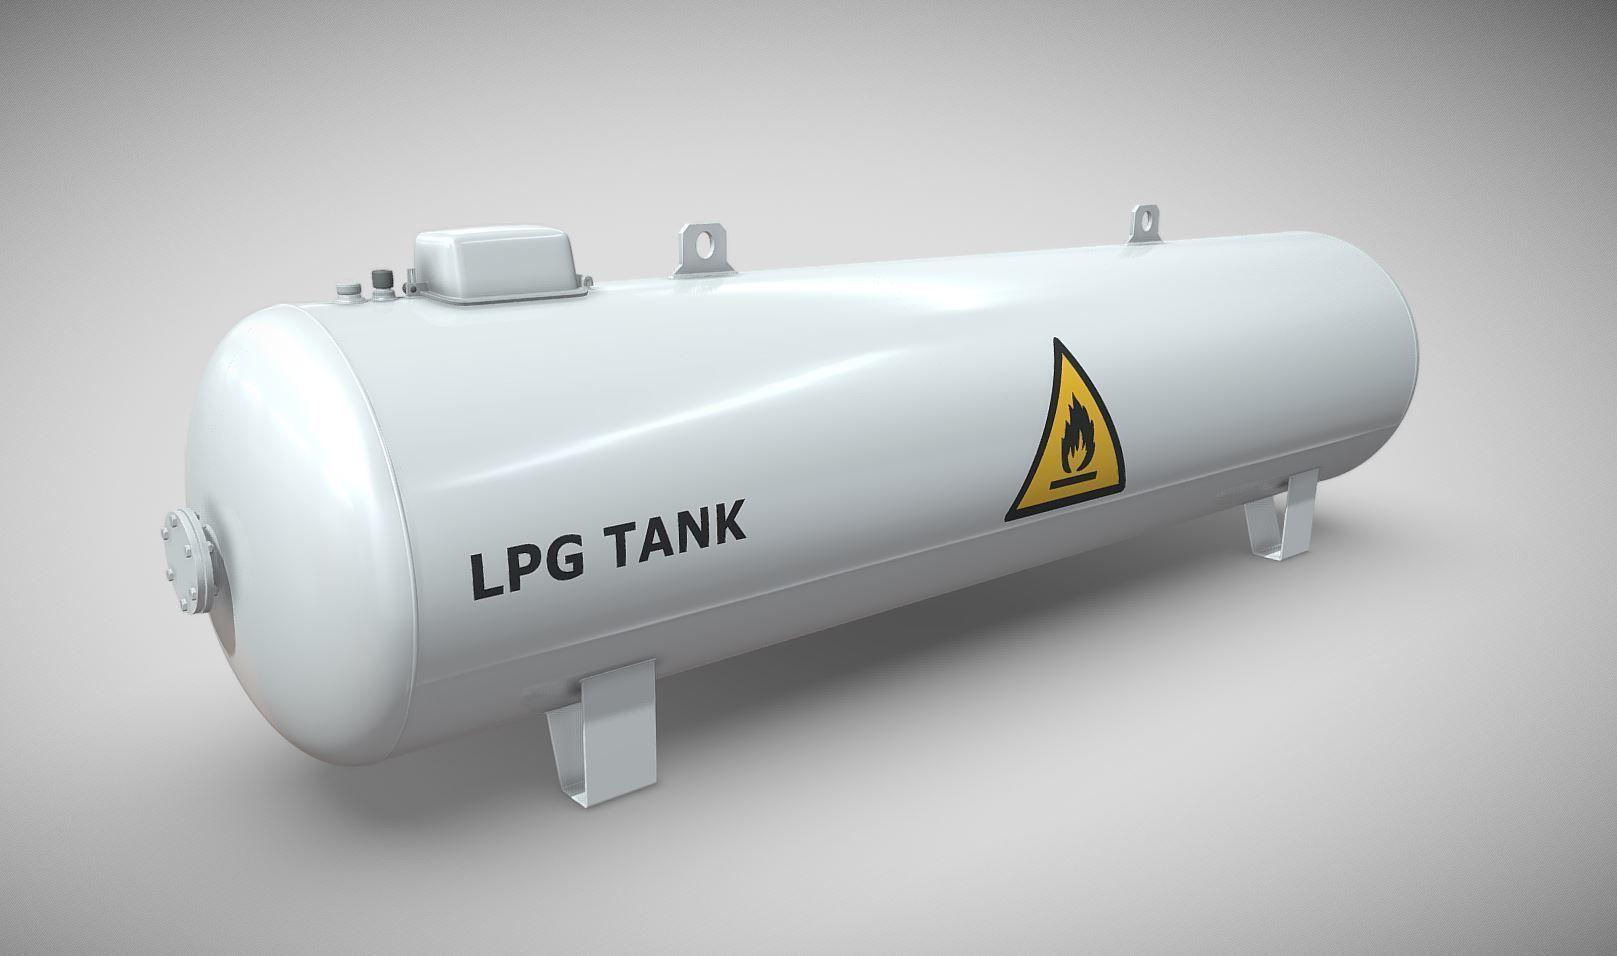 Liquefied Petroleum Gas Tank High-Poly